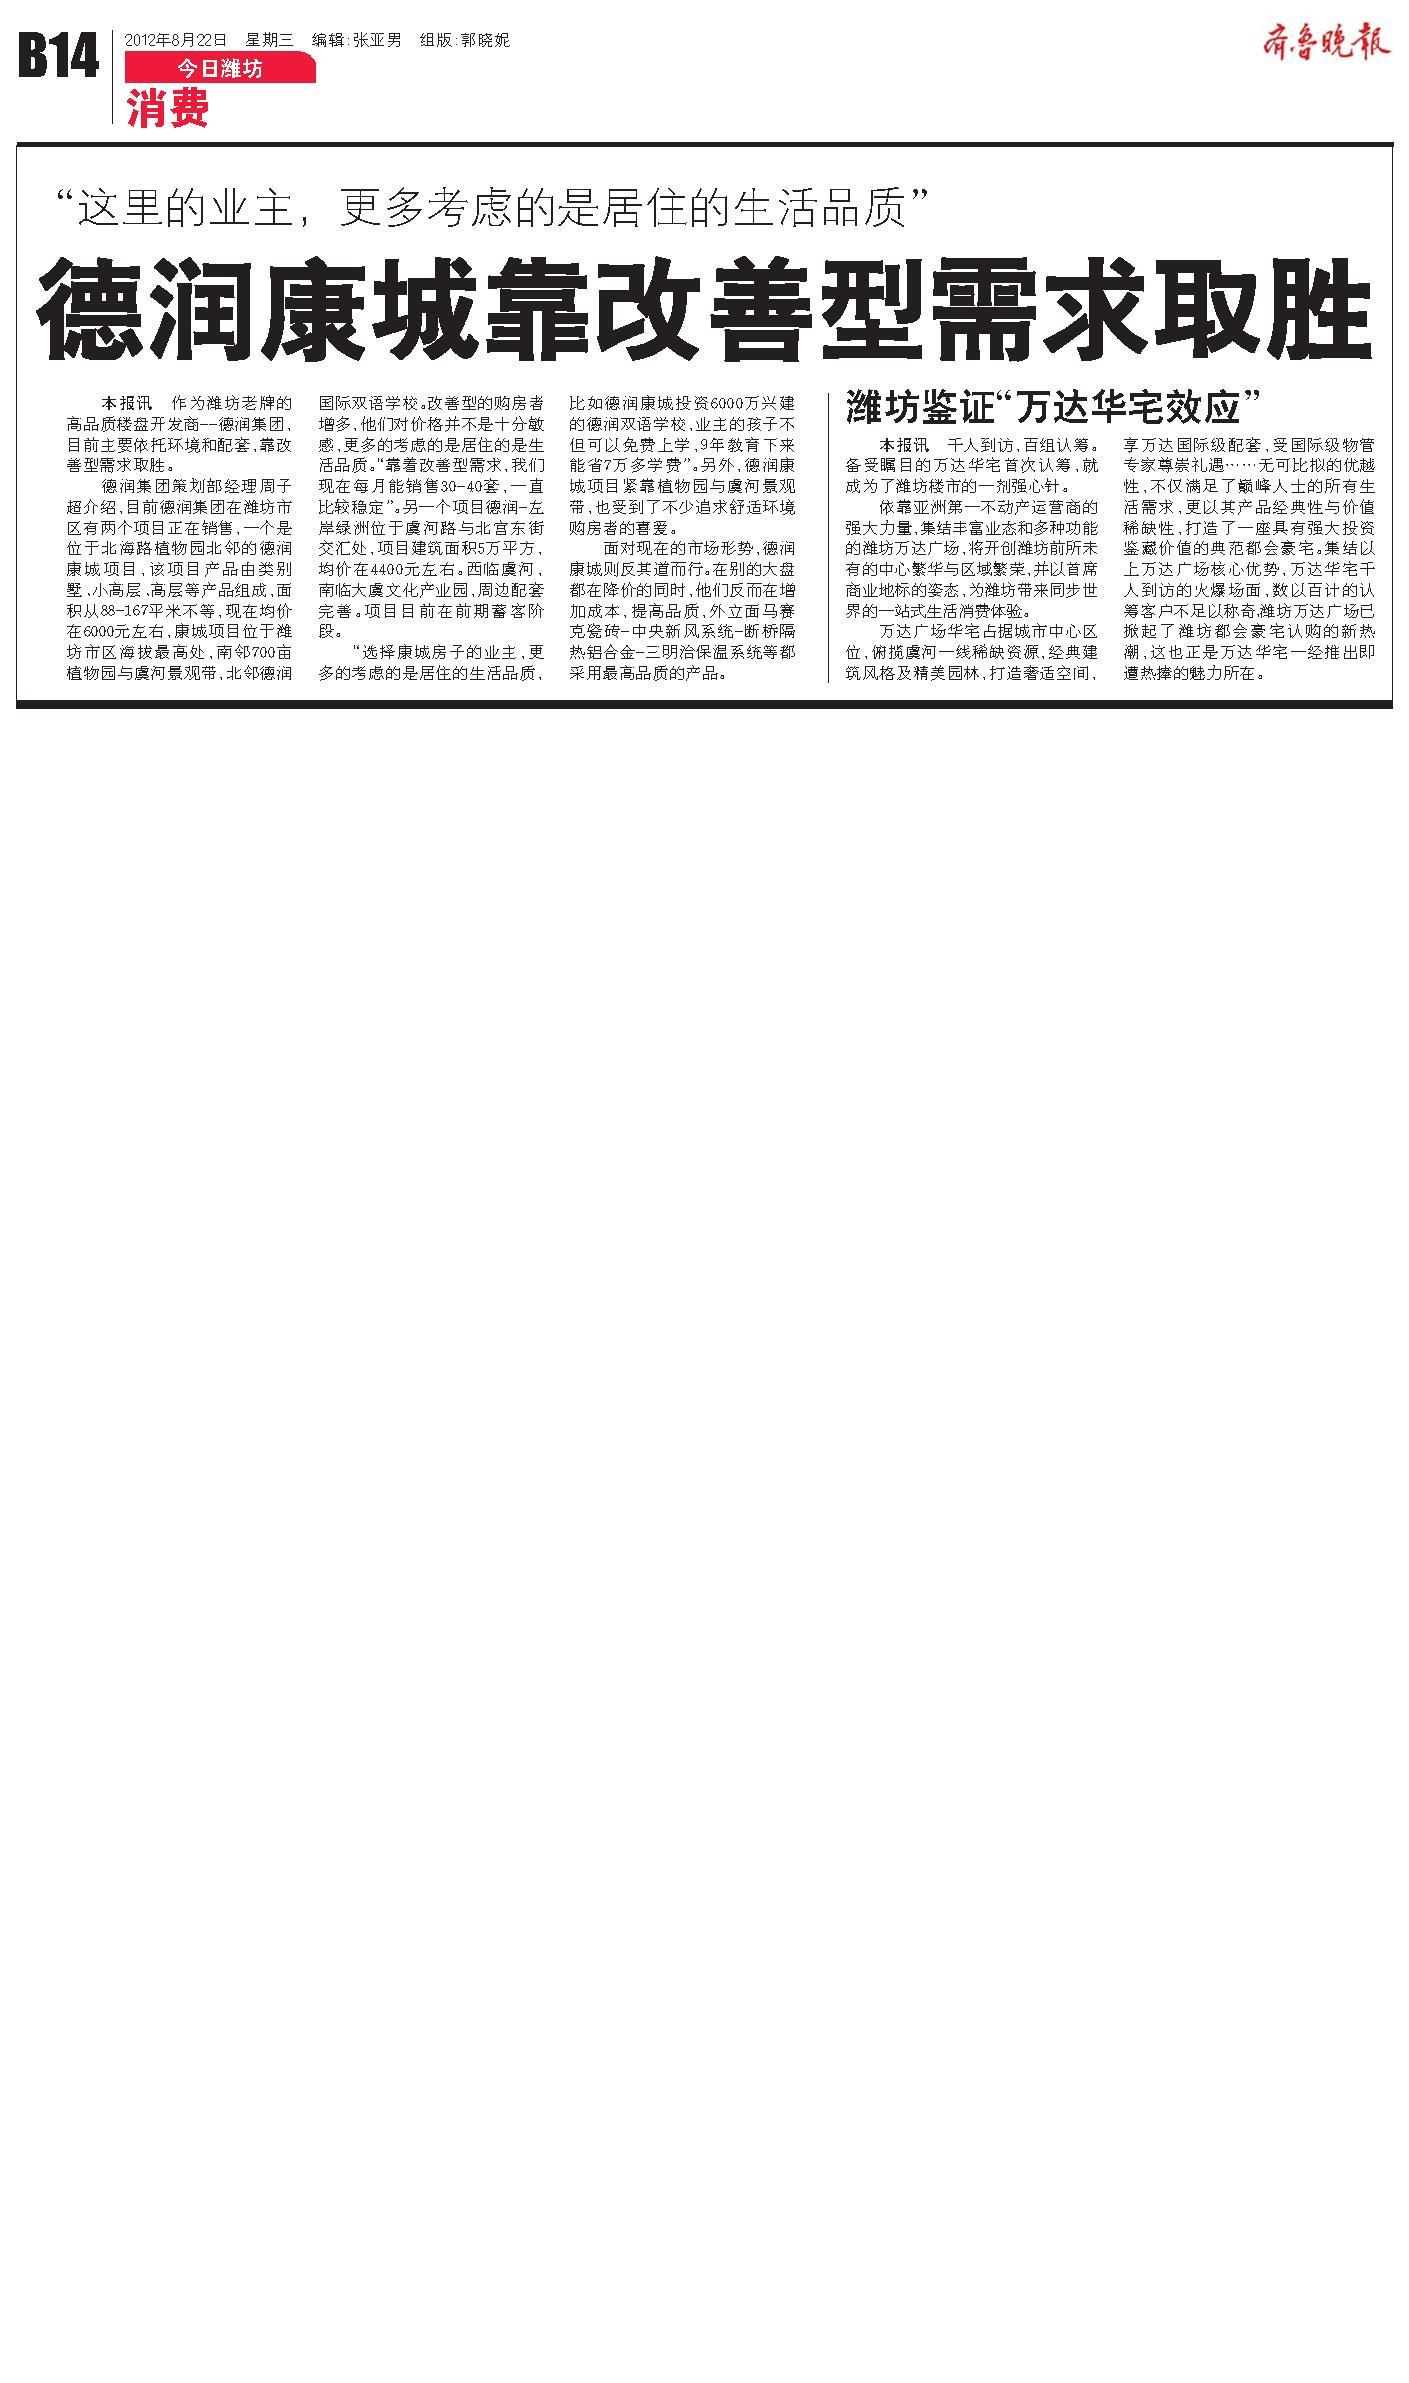 epaper.qlwb.com.cn - /qlwb/IMAGE/20120822/K14/